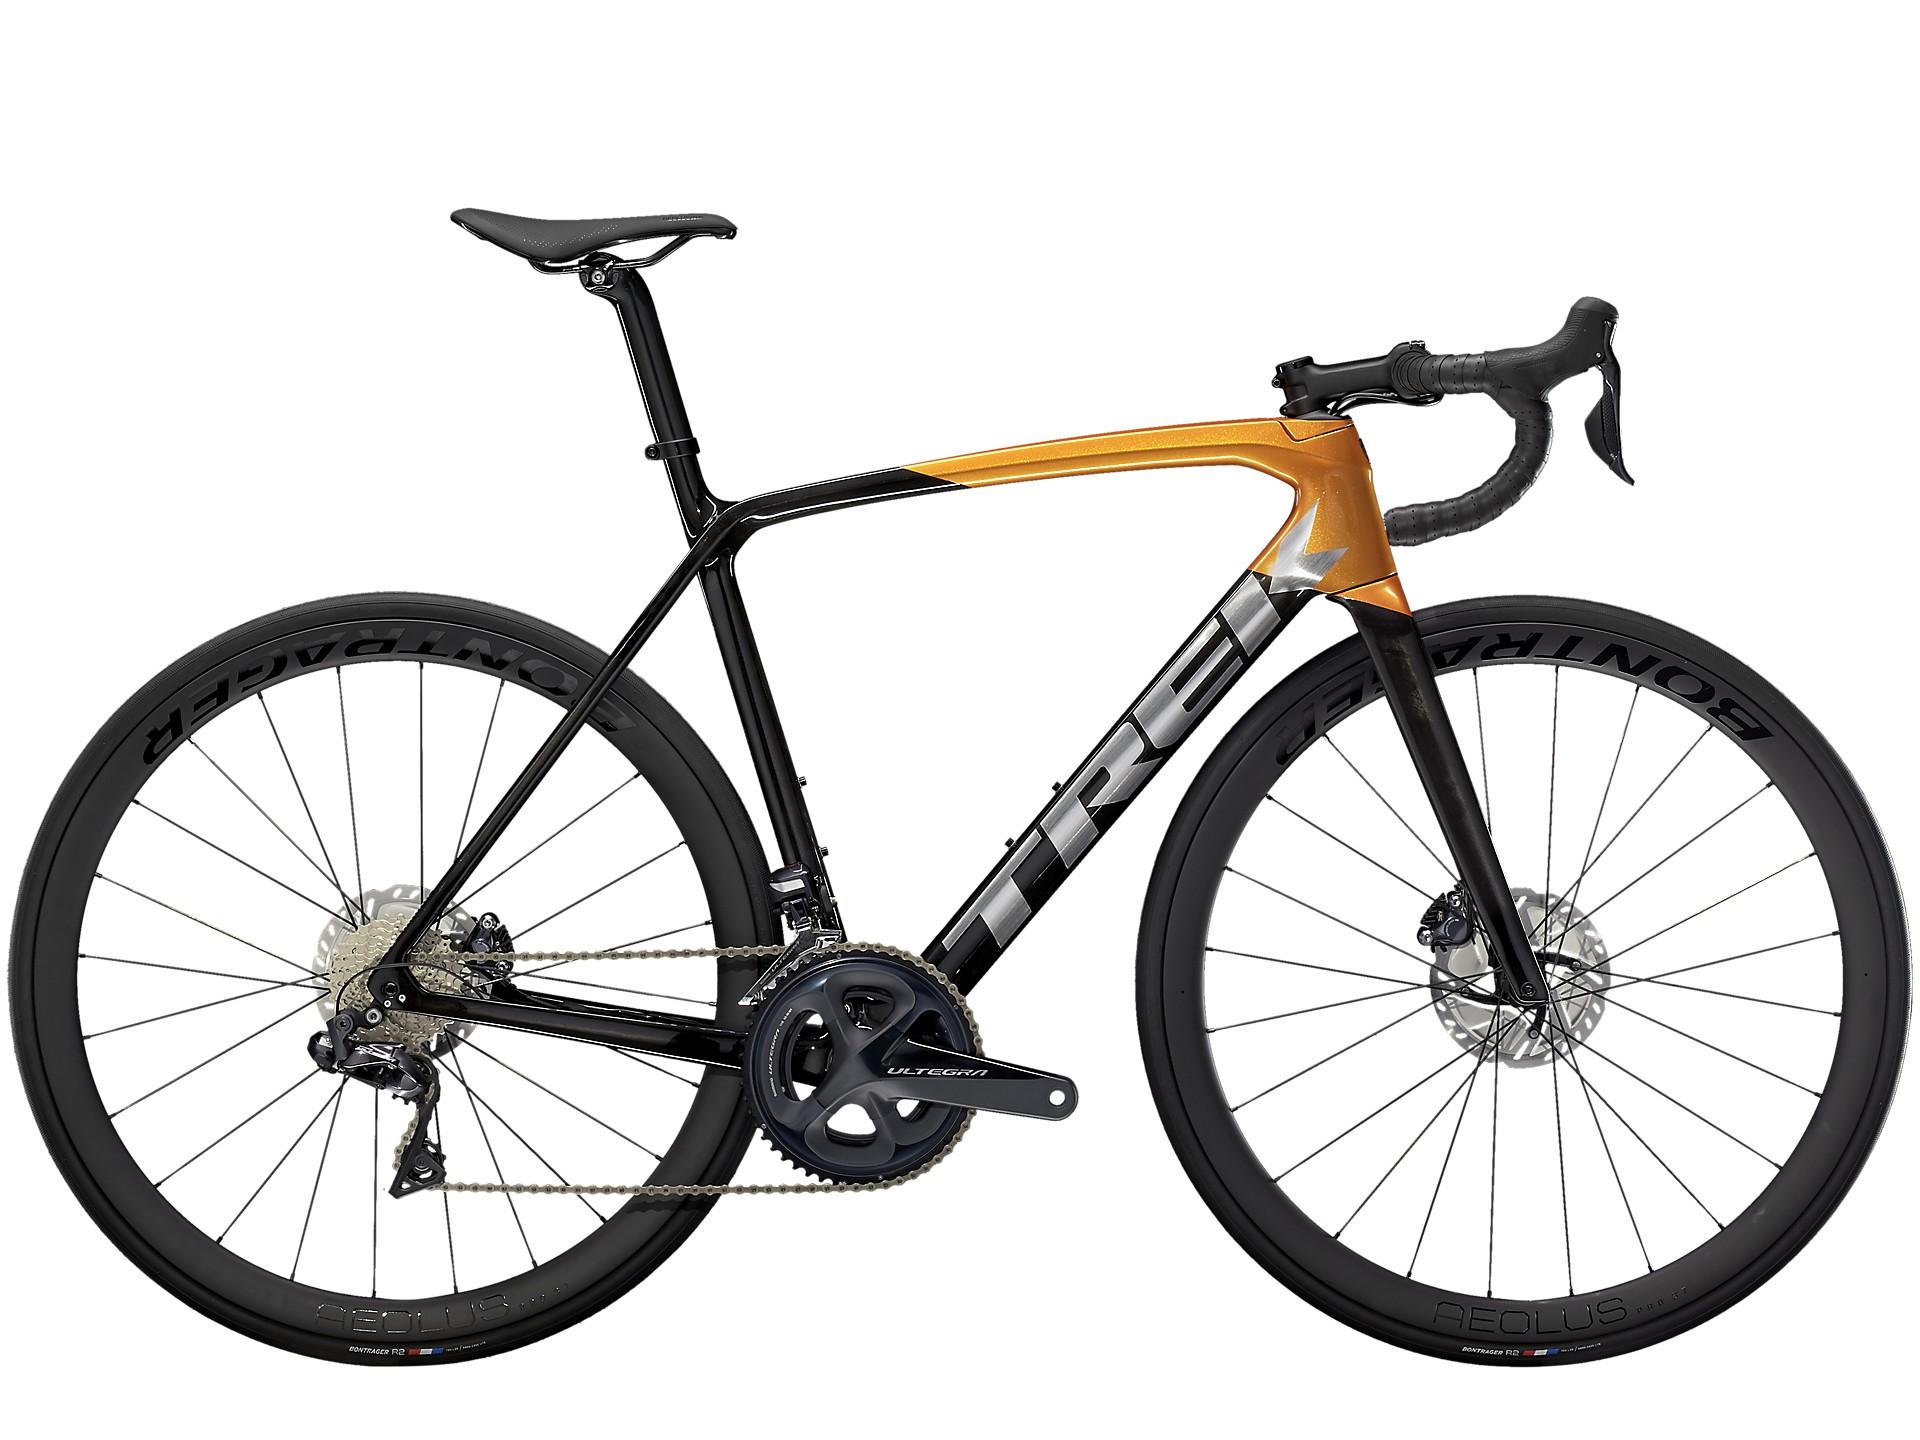 Bicicleta Trek Émonda SL 7 Shimano Ultegra Di2